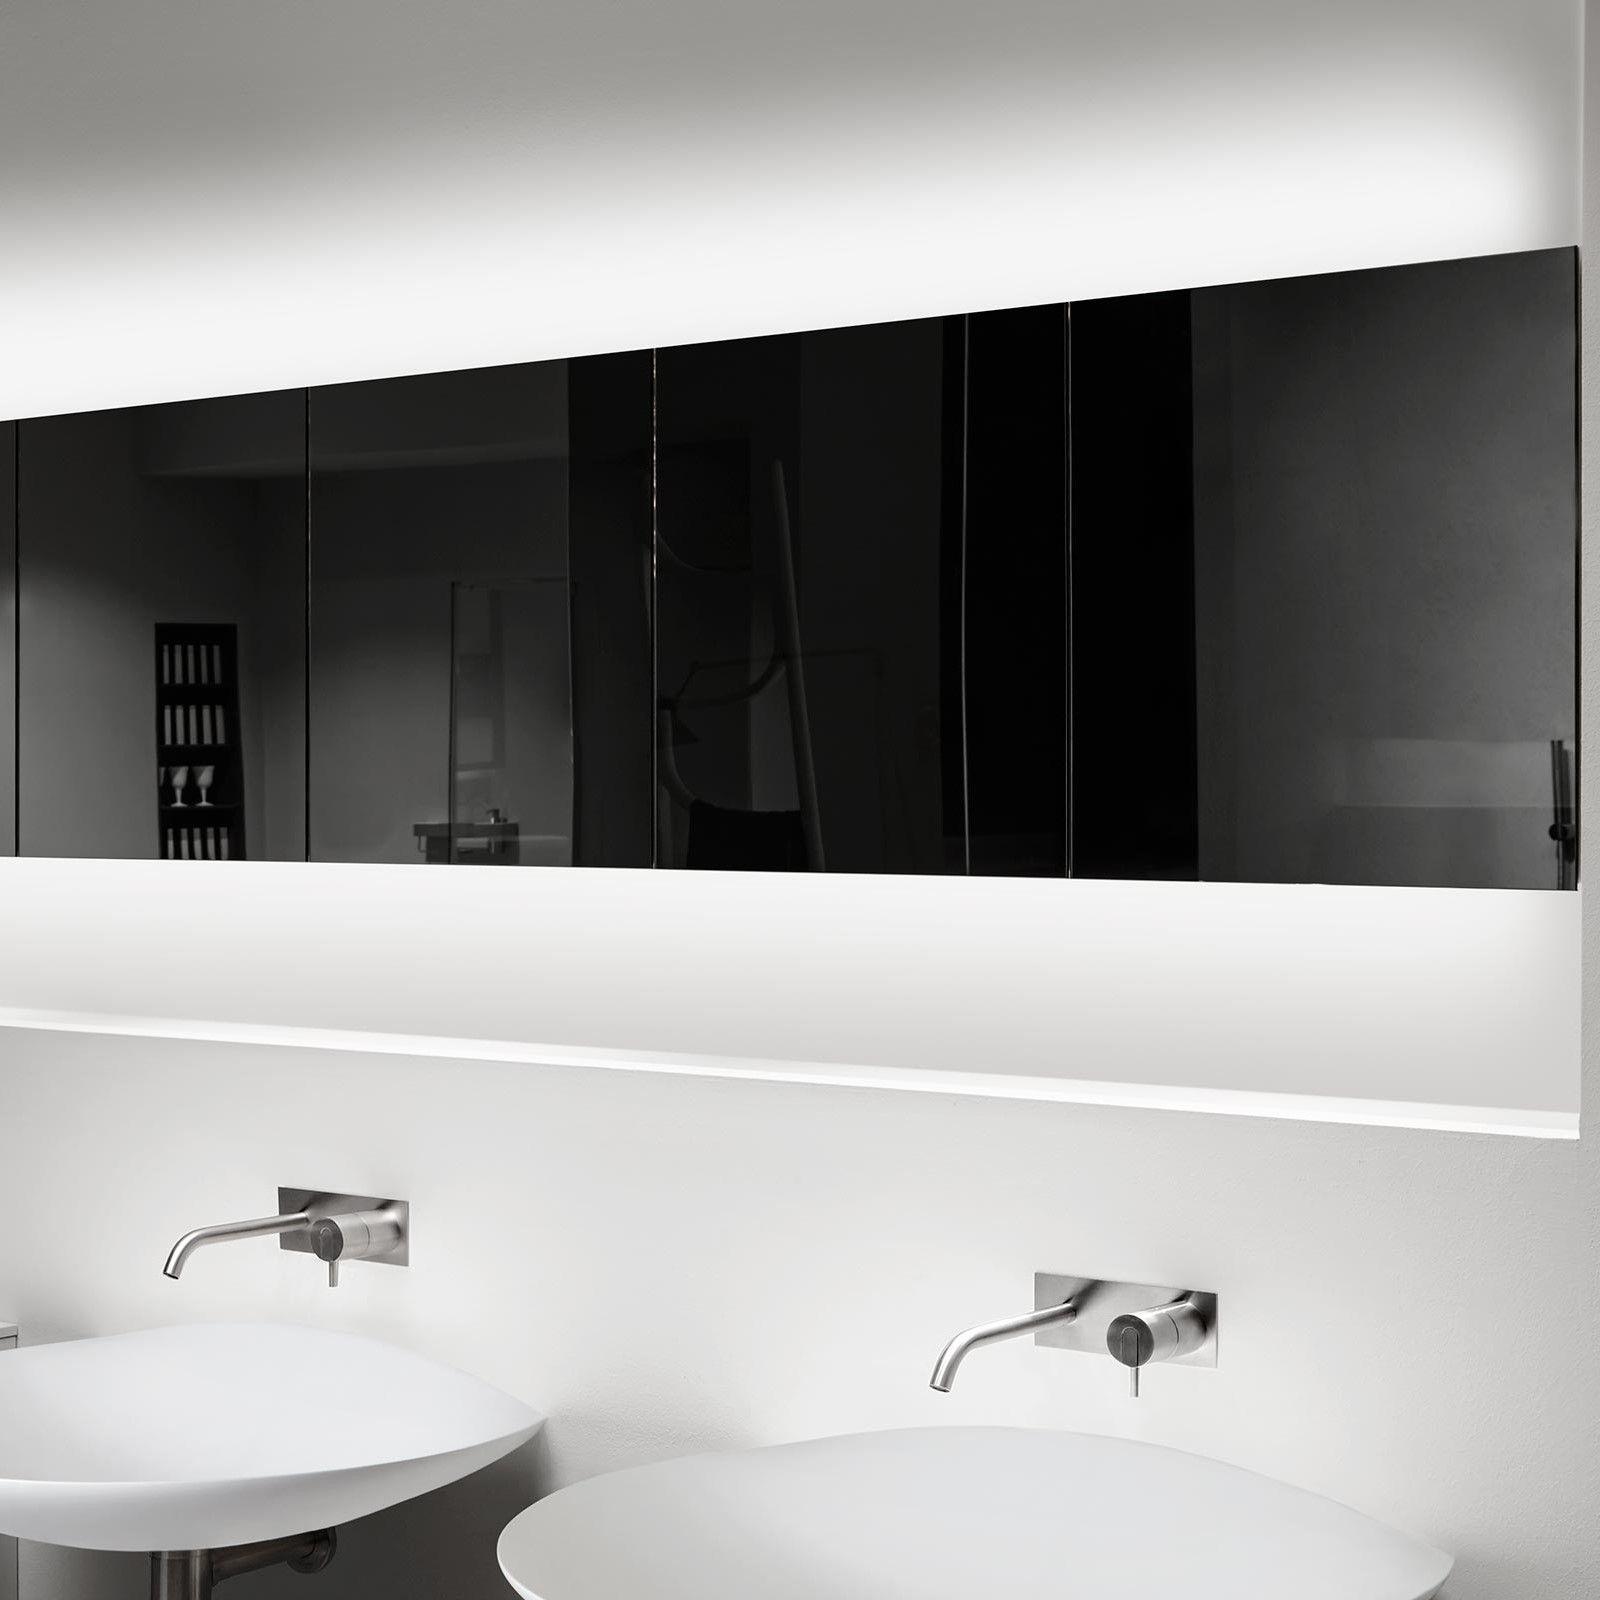 Зеркальный шкаф Antonio Lupi Mantra Mantra290 ФОТО